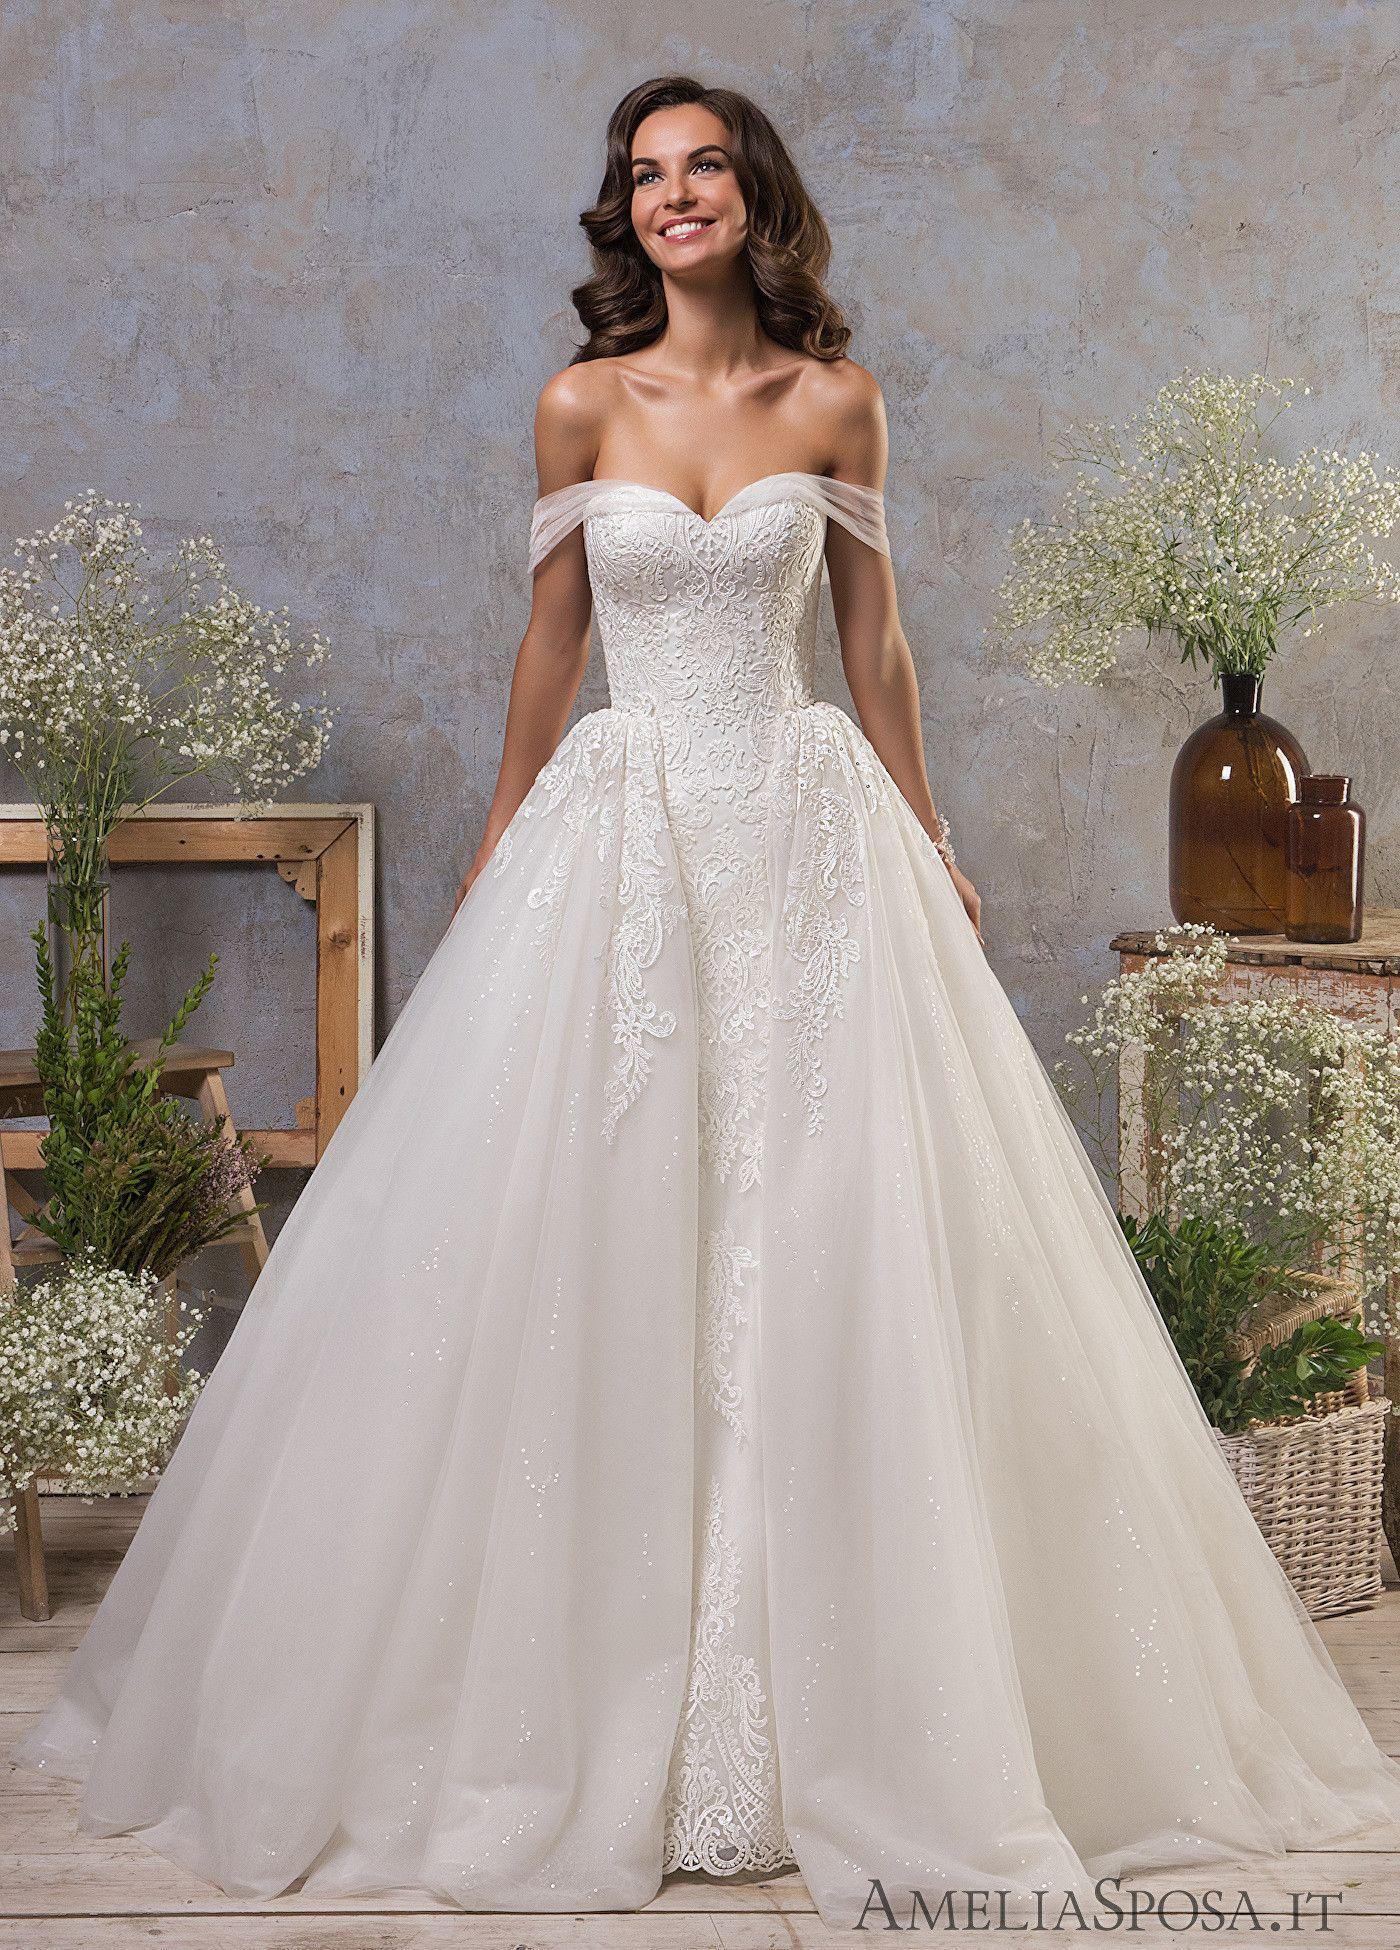 Wedding Dress Ines Ameliasposa Italianweddingdress Amelia Sposa Wedding Dress Flattering Wedding Dress Wedding Dresses Lace